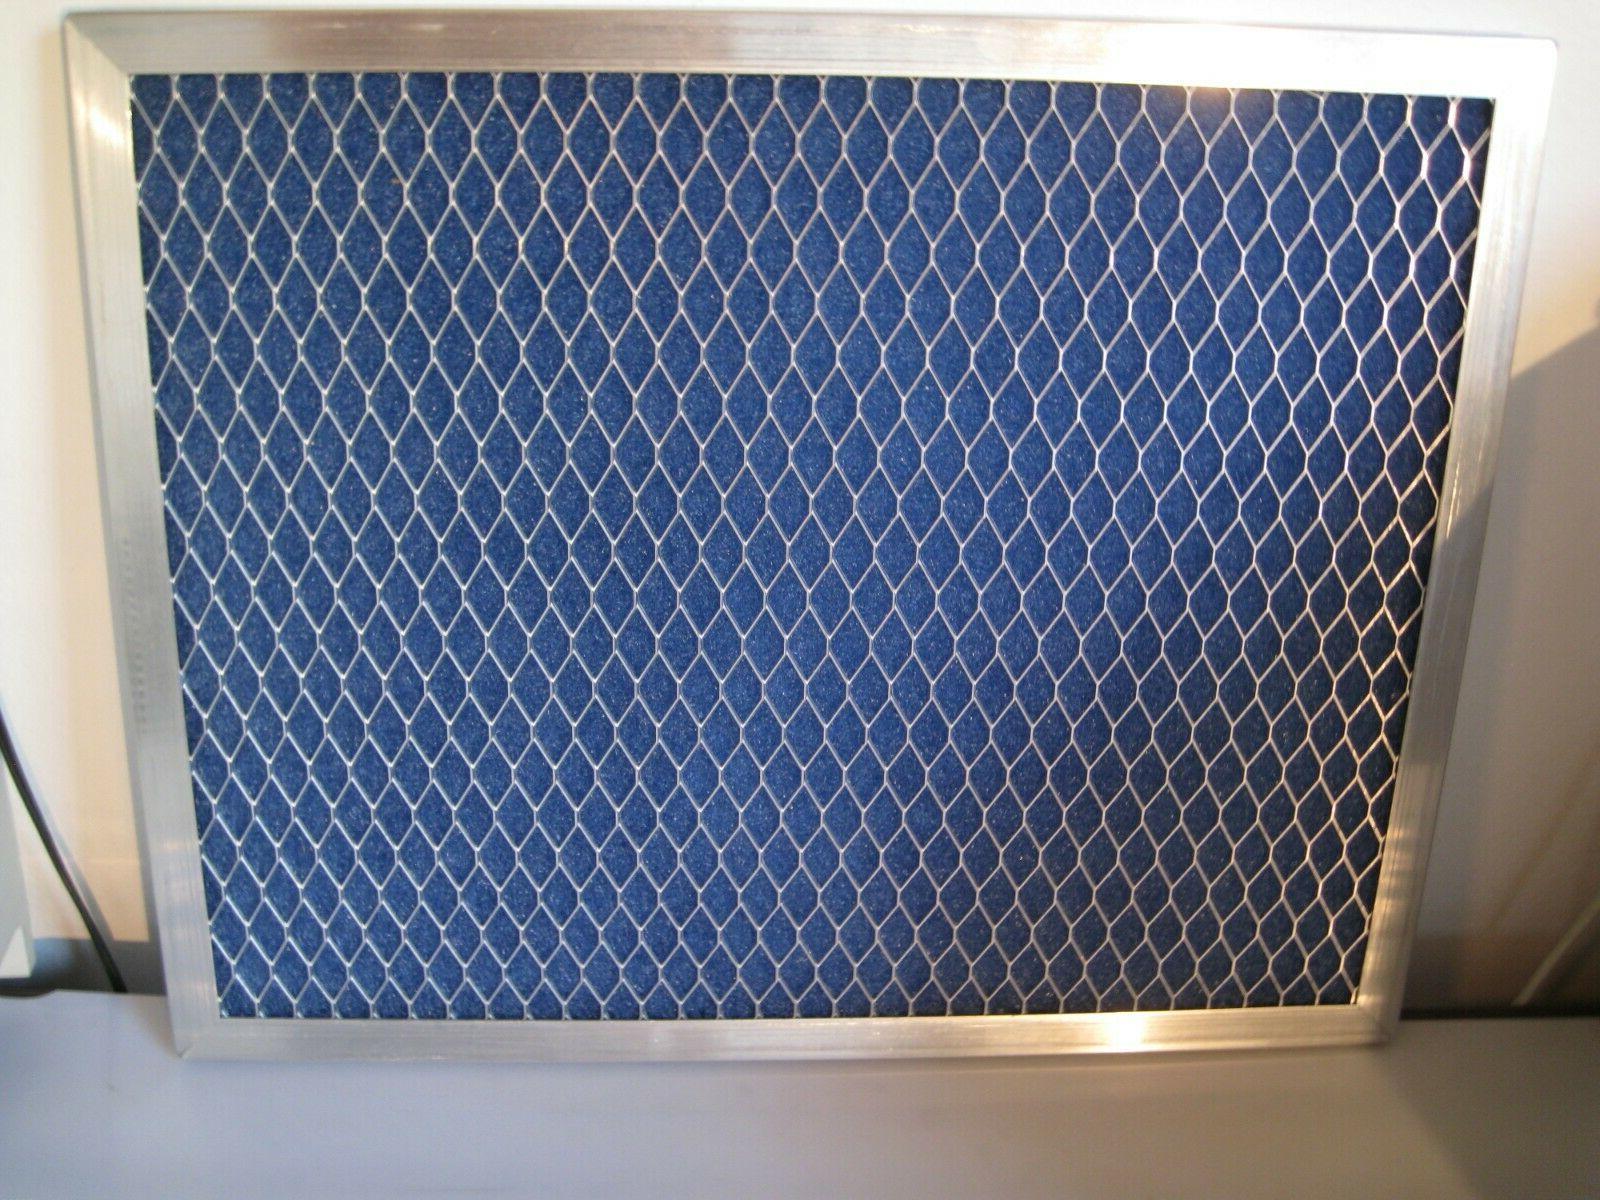 PERMANENT WASHABLE  ELECTROSTATIC FURNACE AC AIR FILTER Dust Electromagnet